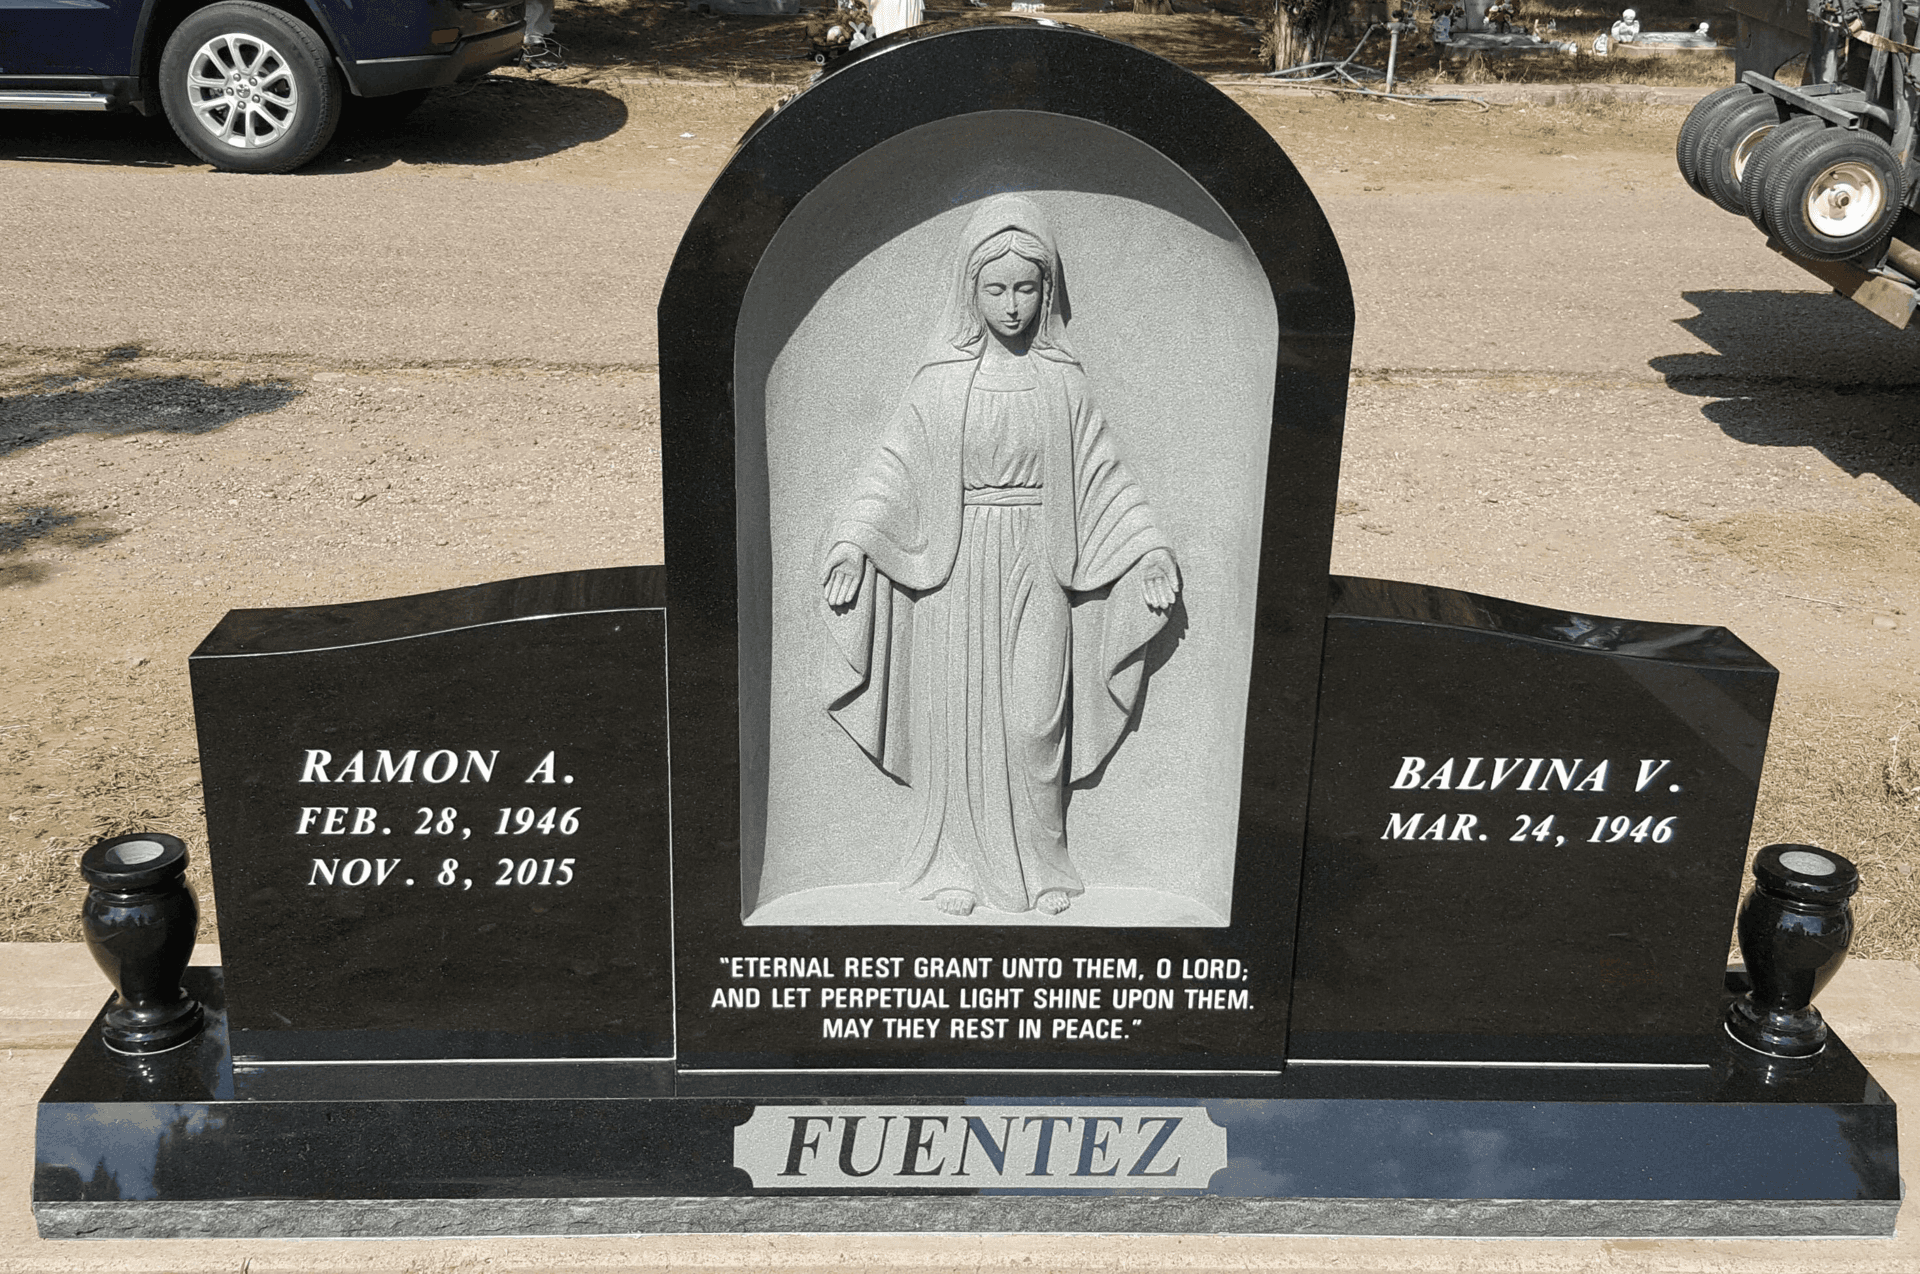 Sheppard memorials inc custom headstones odessa tx granite custom headstones in the crane tx and odessa tx areas jeuxipadfo Gallery